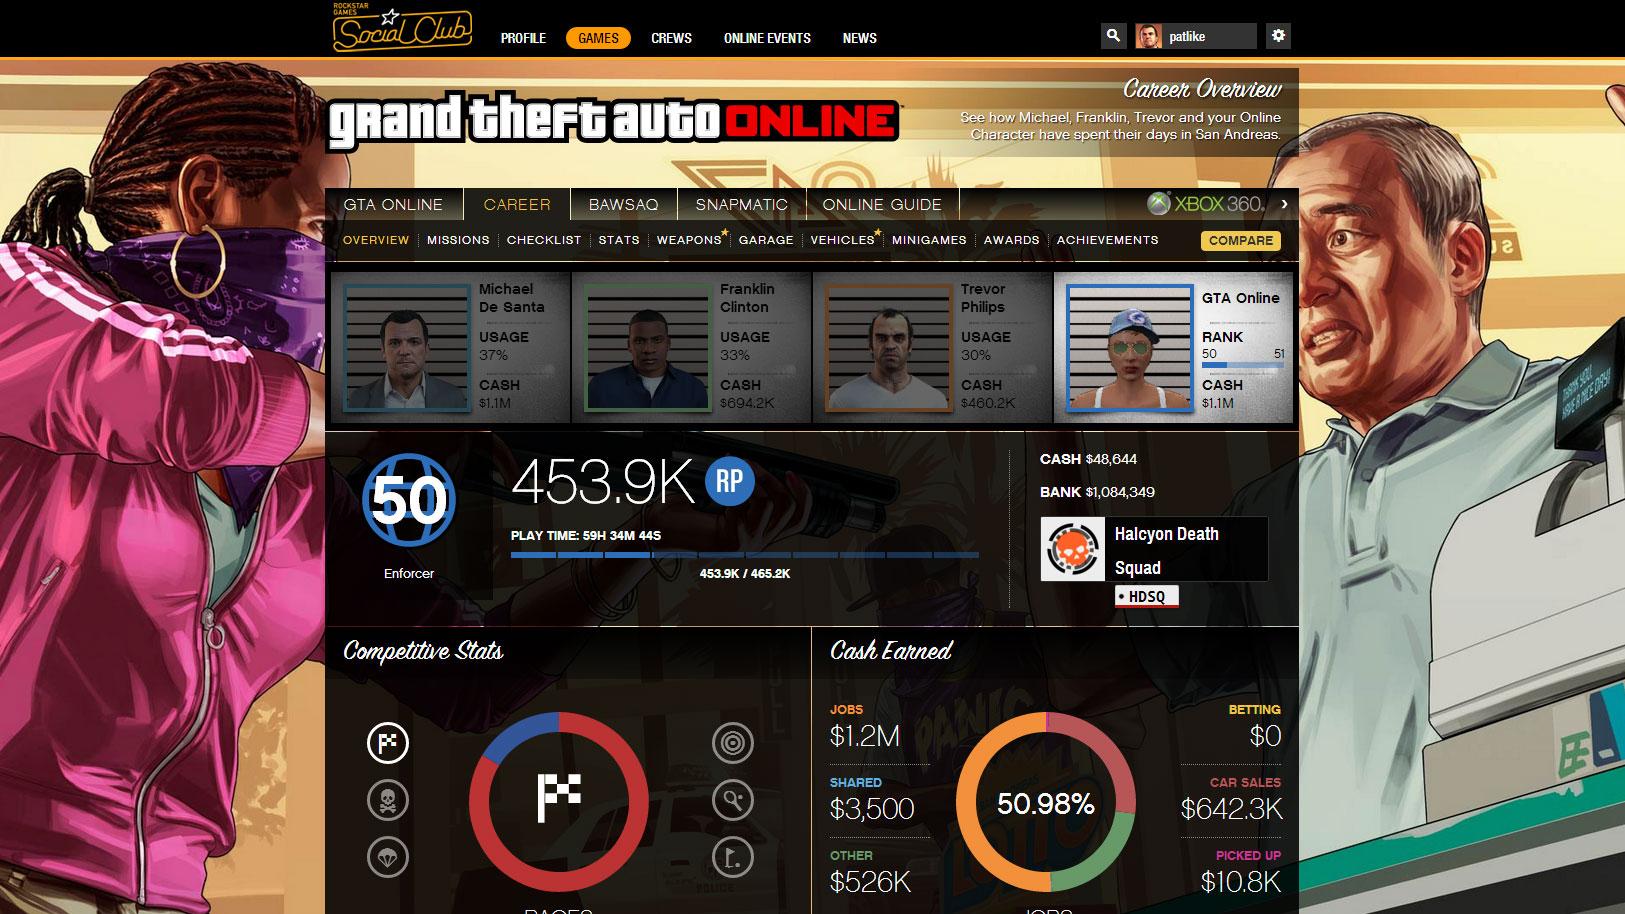 gta_online_rank_50